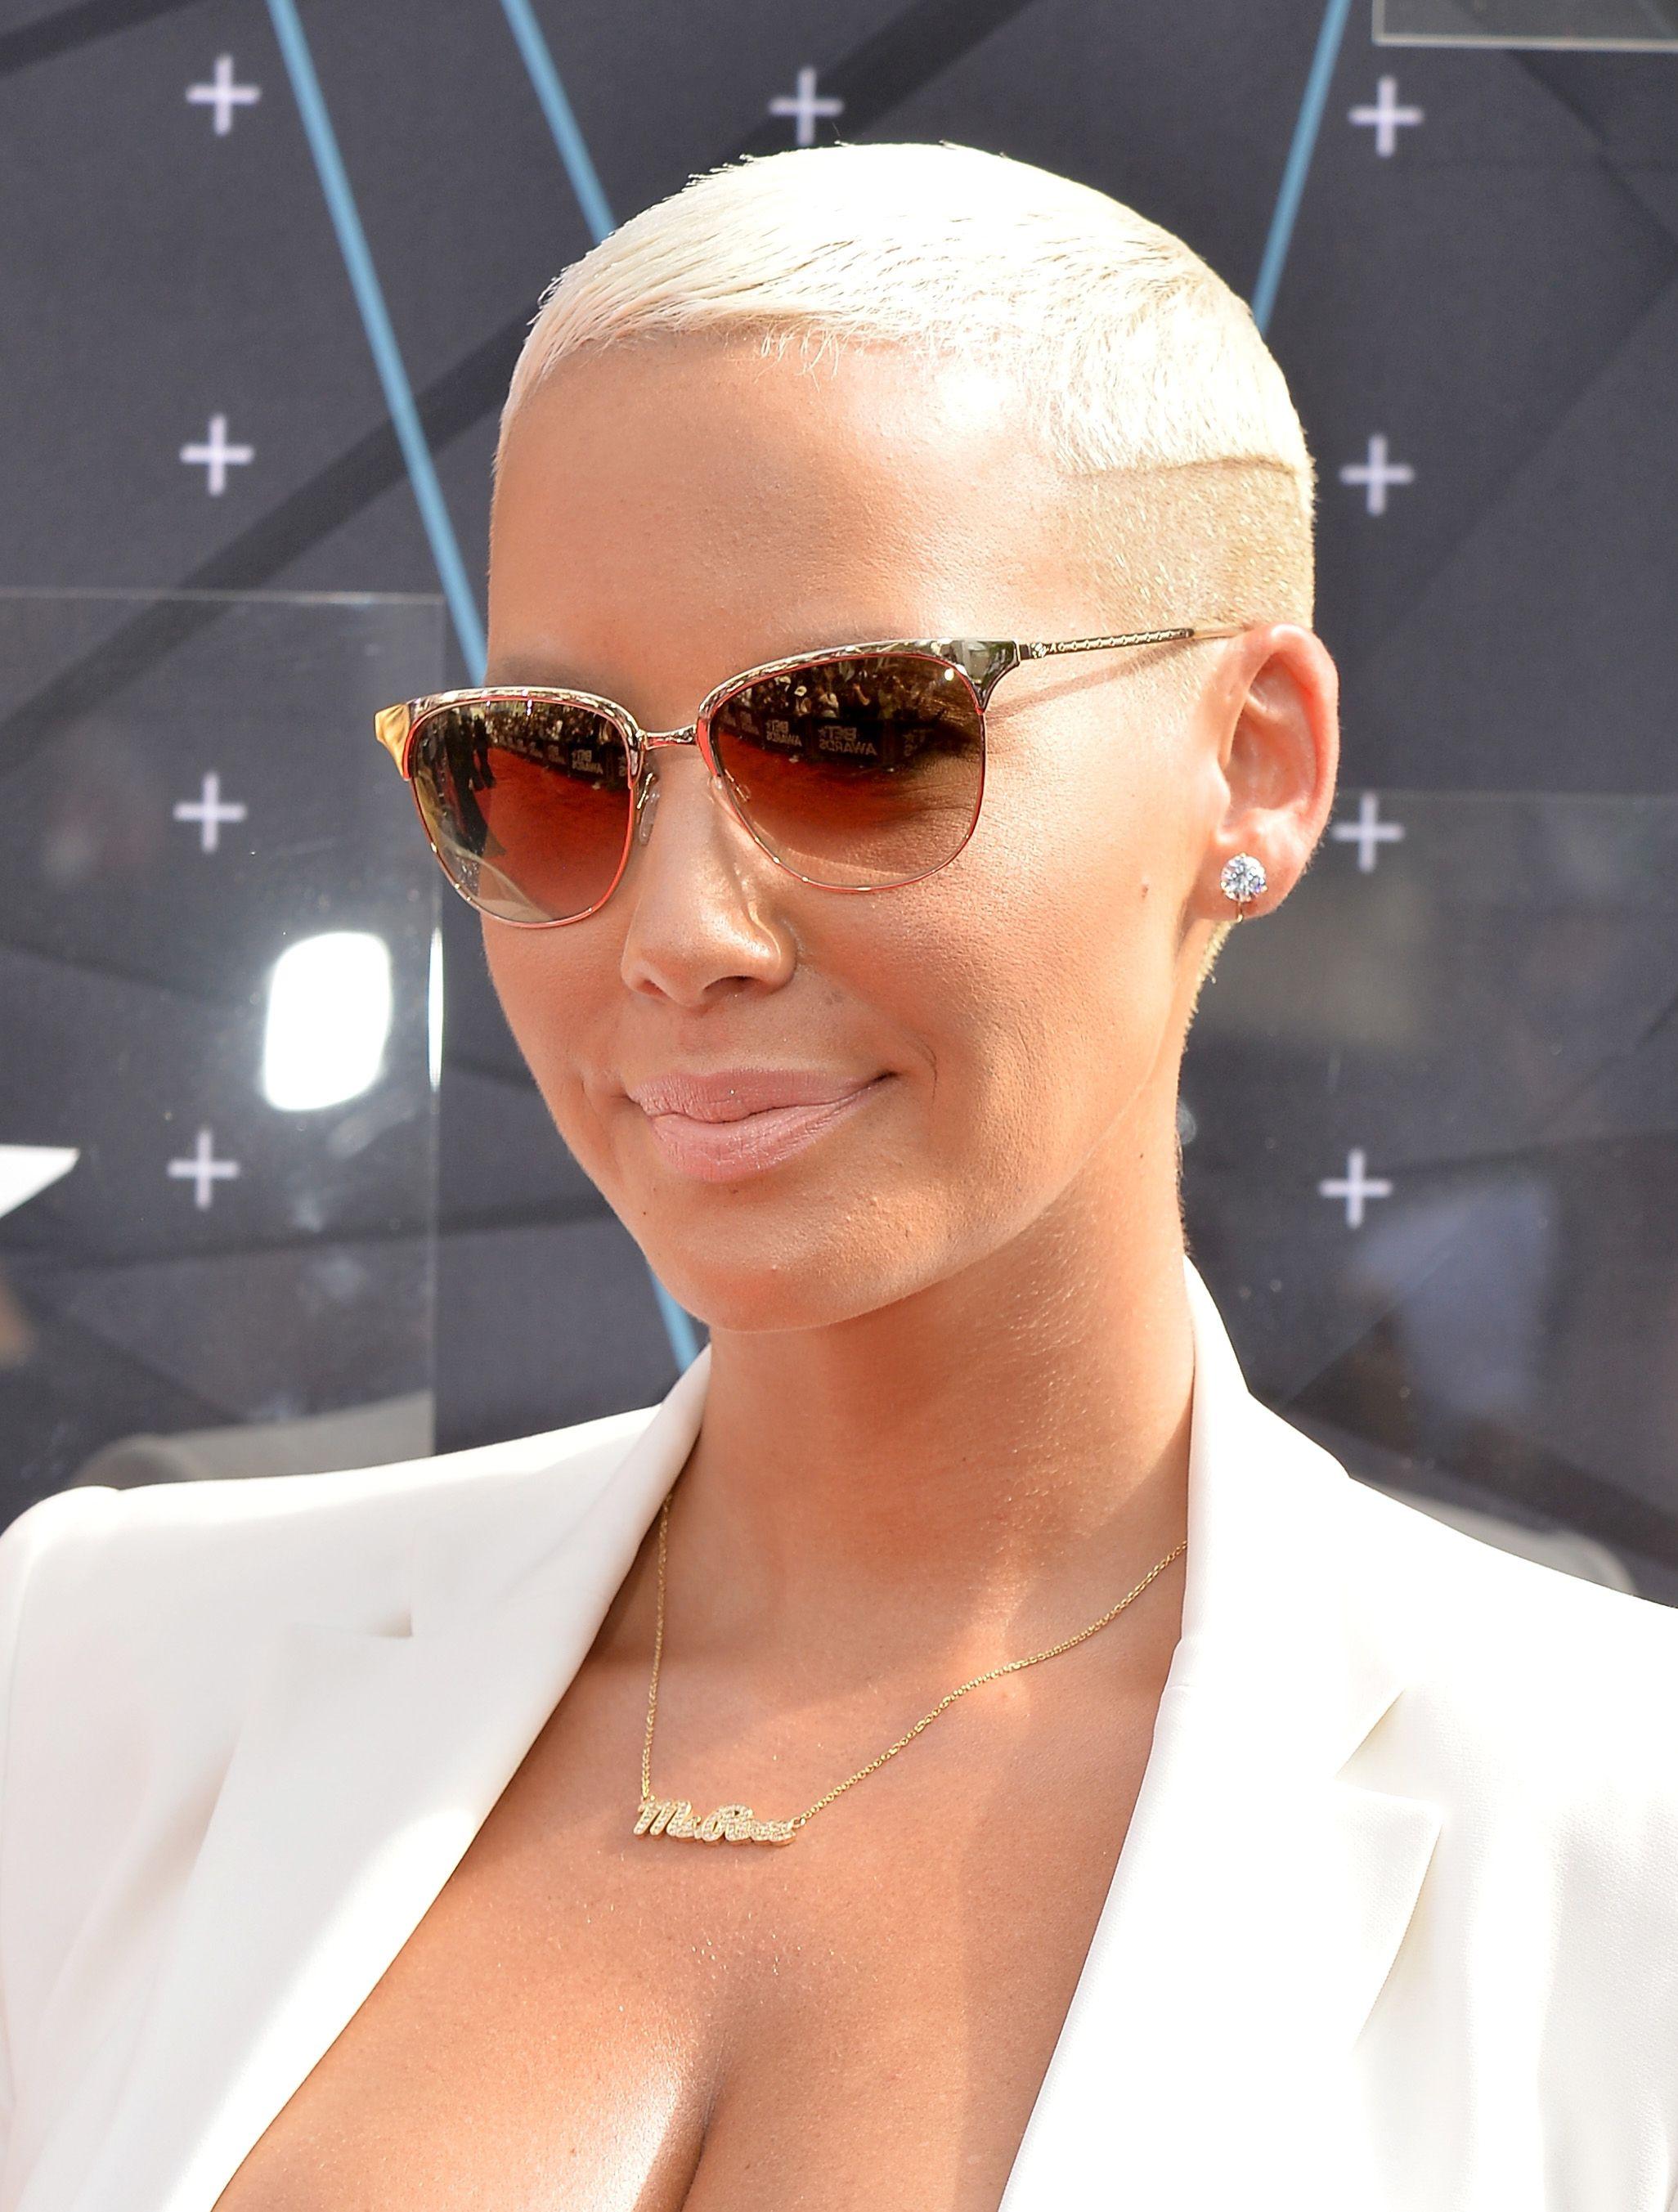 Cringe: Gwyneth Paltrow is Selling 1,695 Rap-ThemedClutches